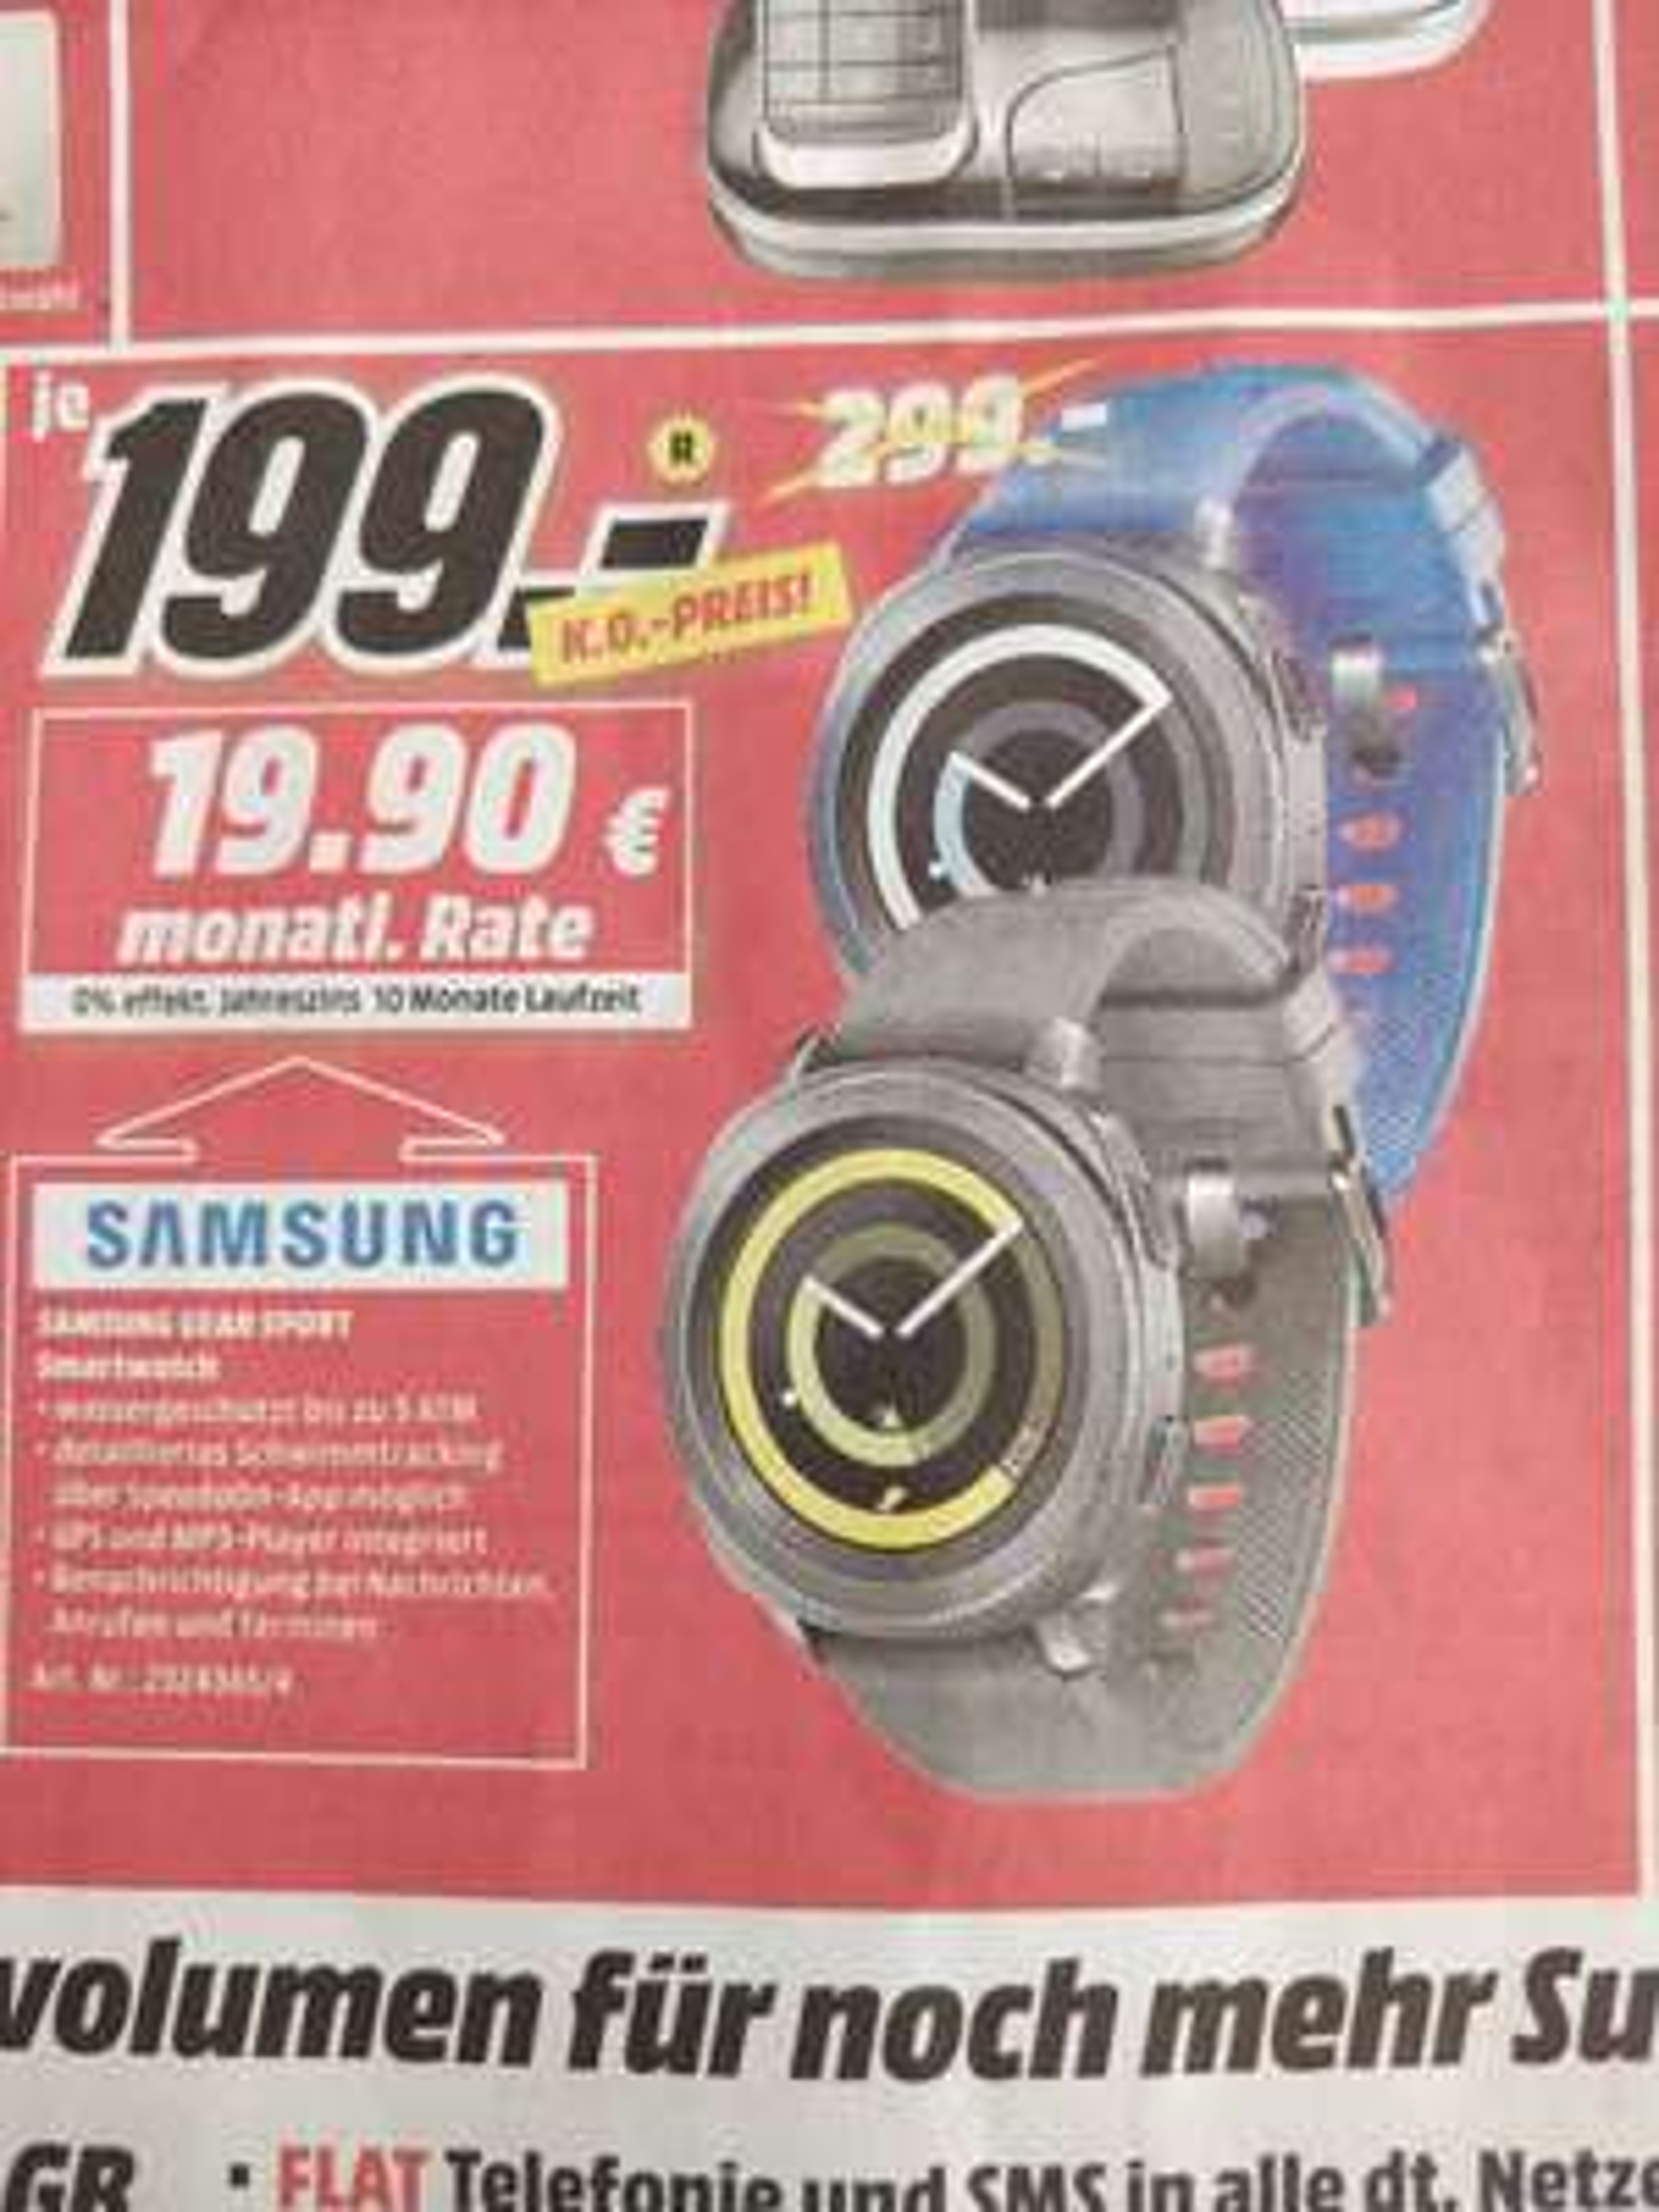 [MM Berlin/Brandenburg] Samsung Gear Sport